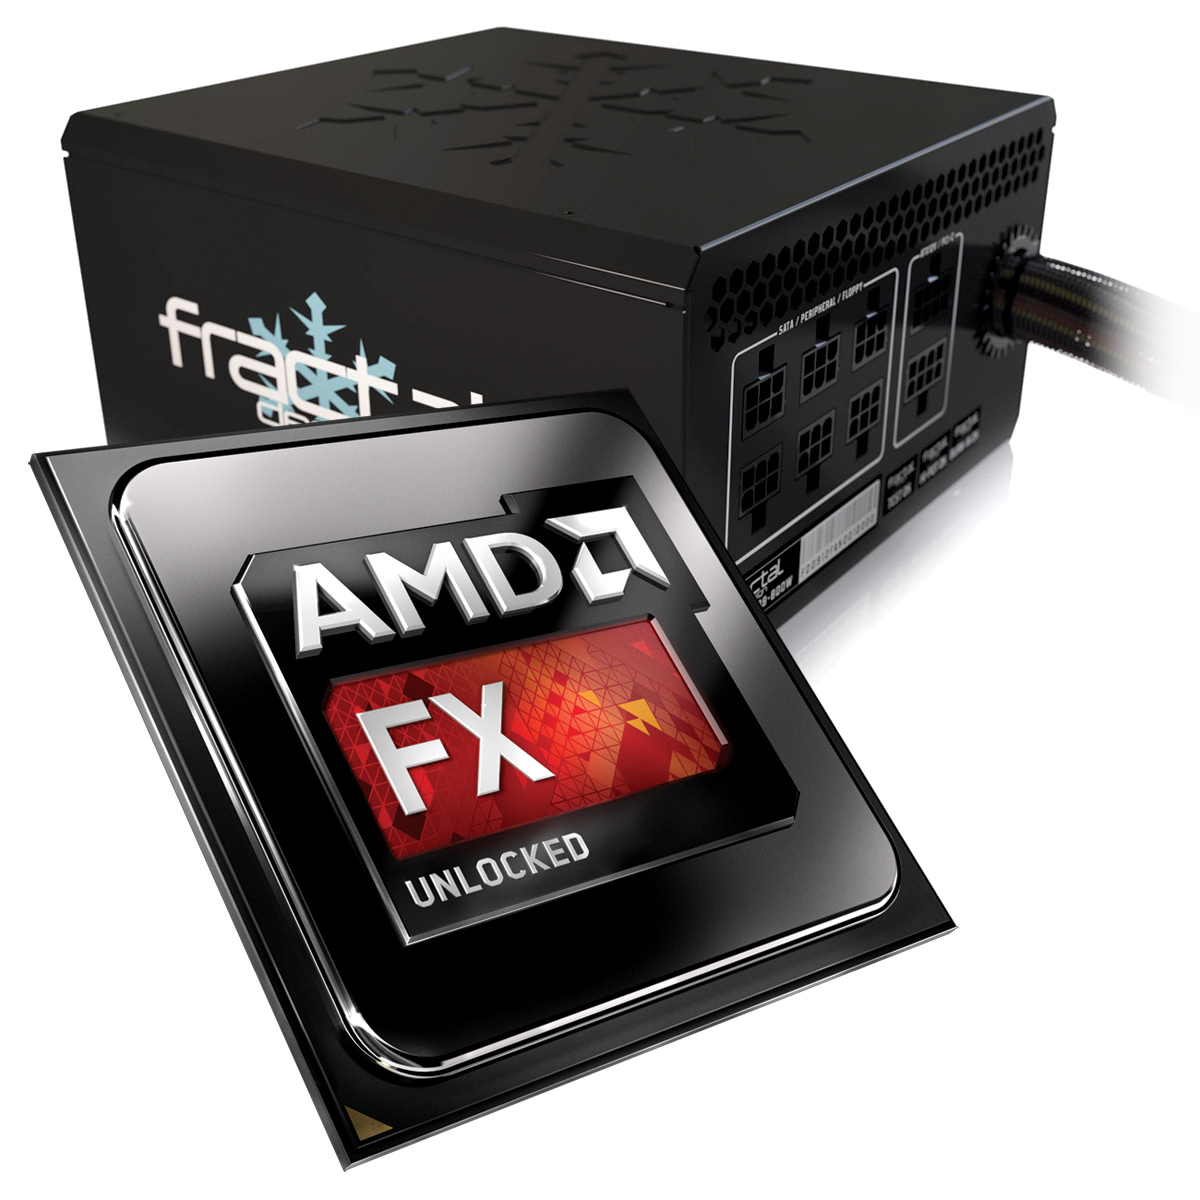 AMD FX 9590 Unlocked 50 GHz Max Turbo Fractal Design